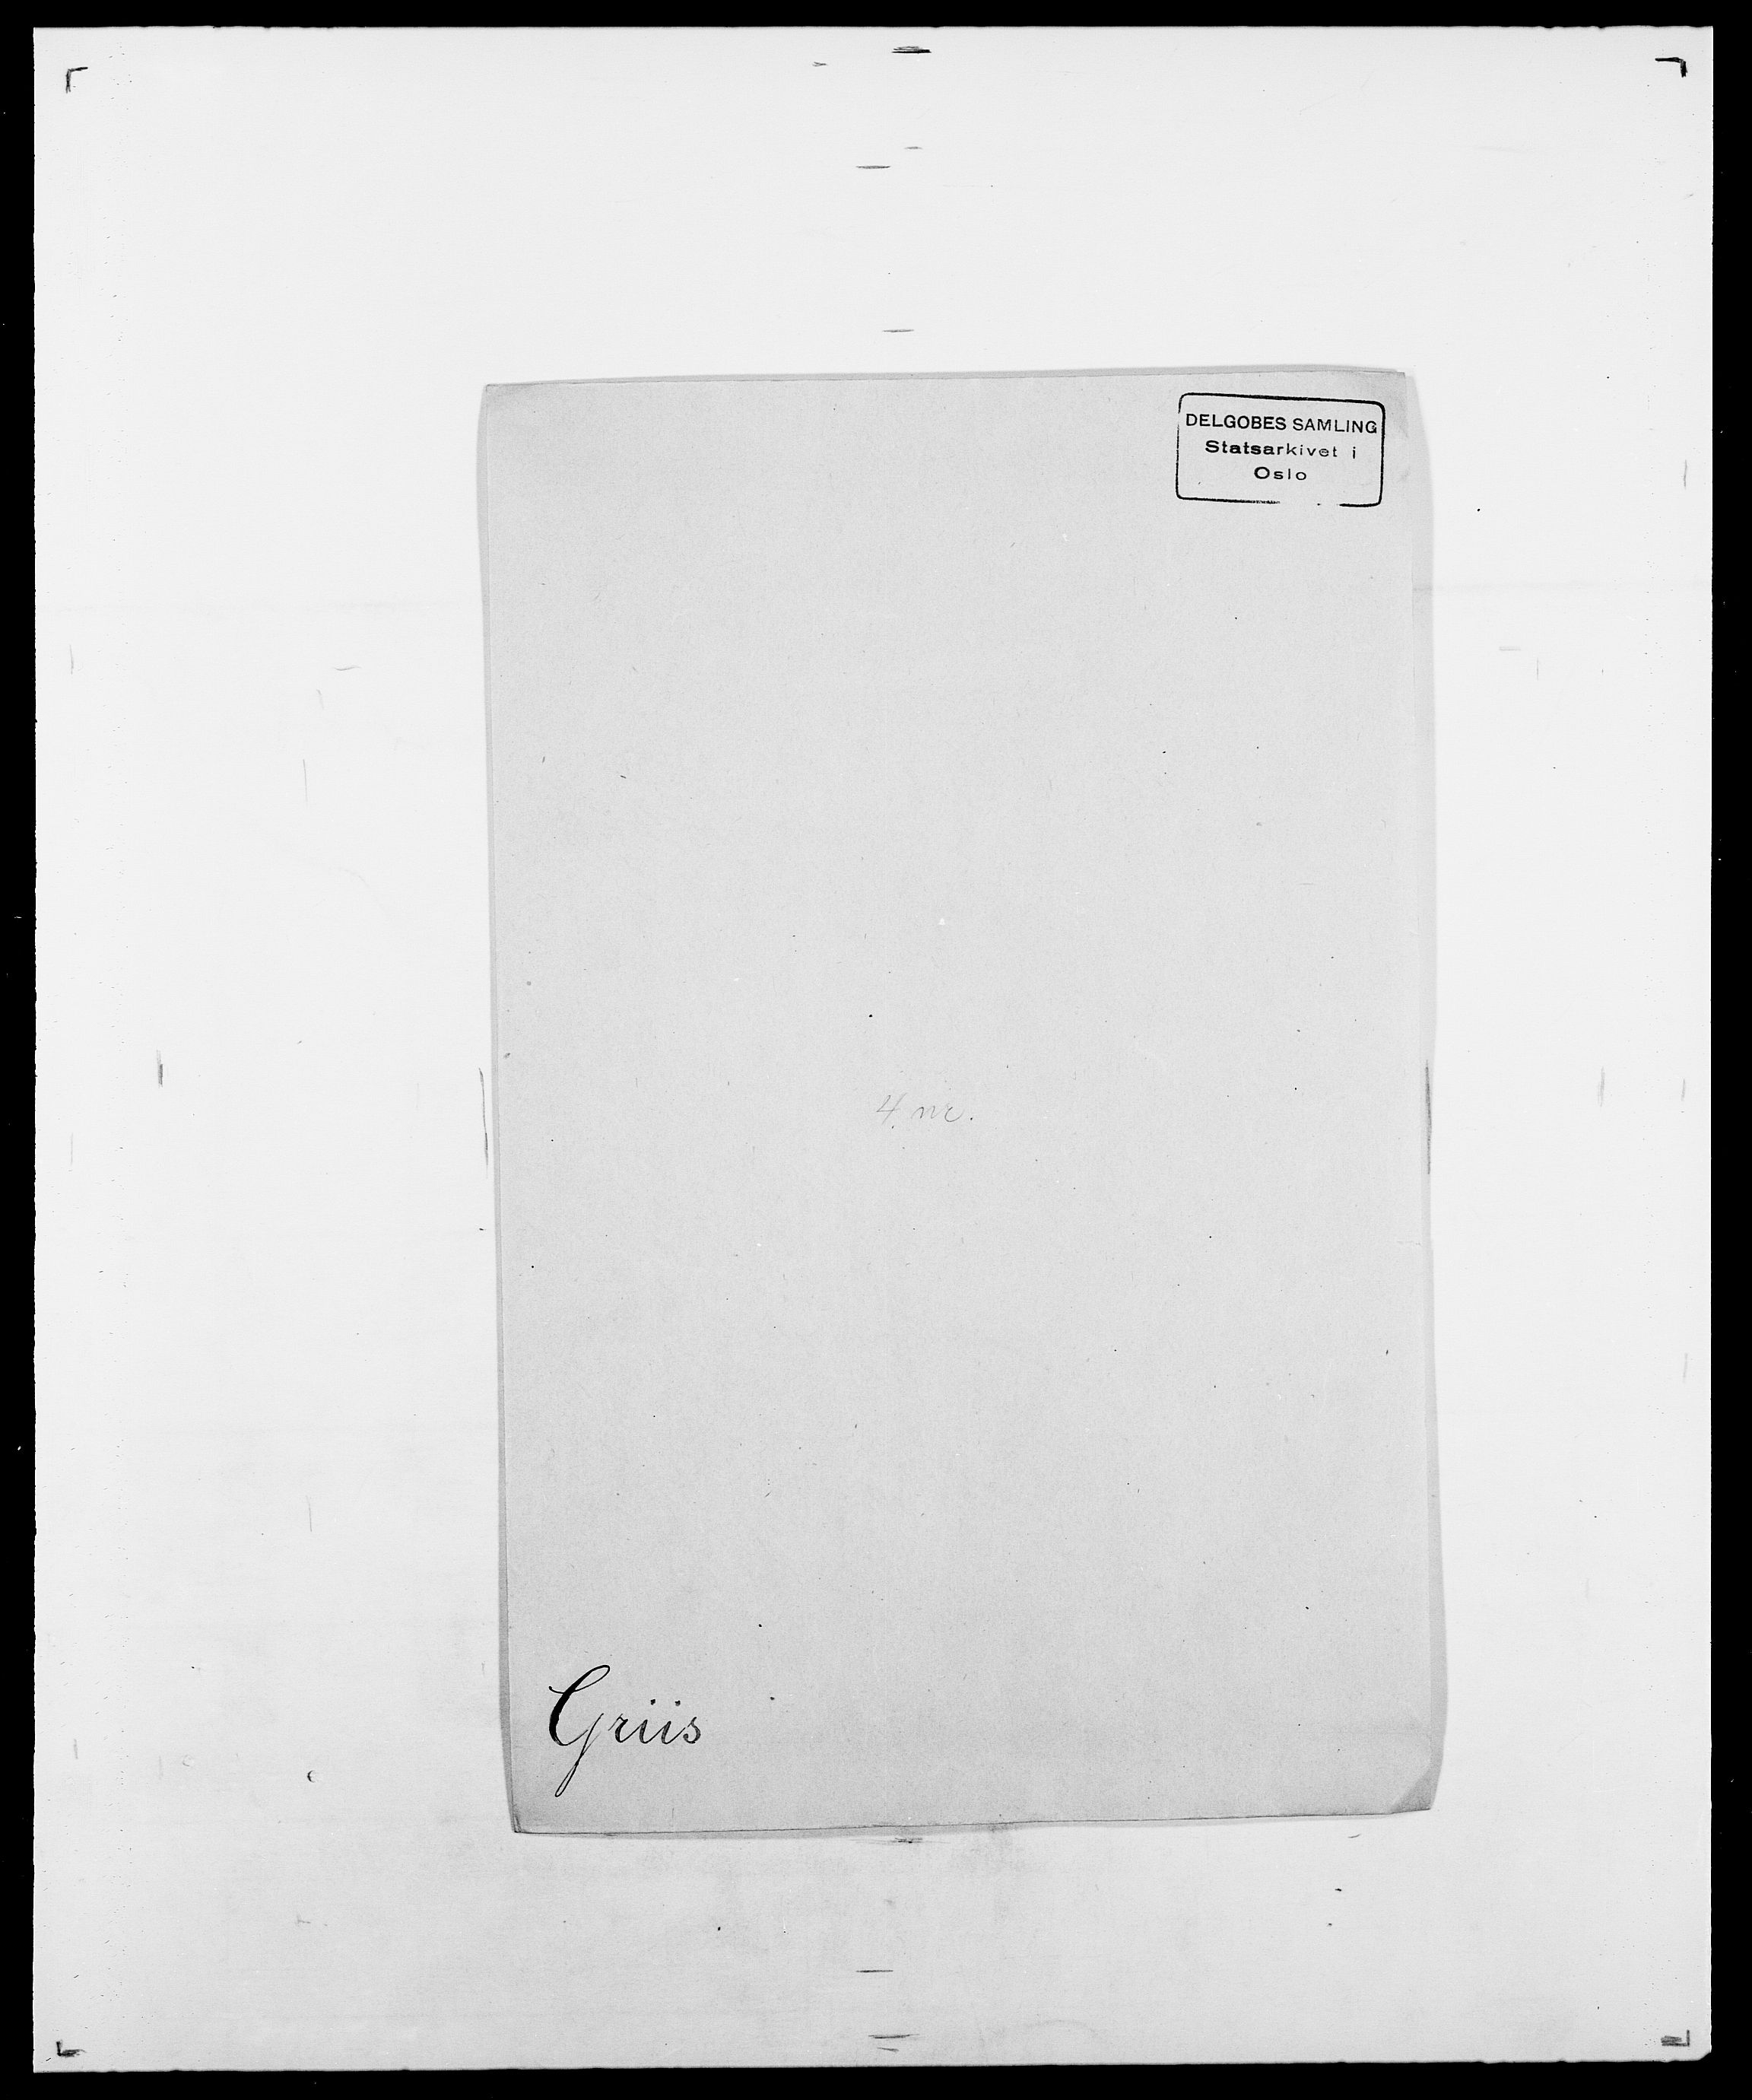 SAO, Delgobe, Charles Antoine - samling, D/Da/L0014: Giebdhausen - Grip, s. 651